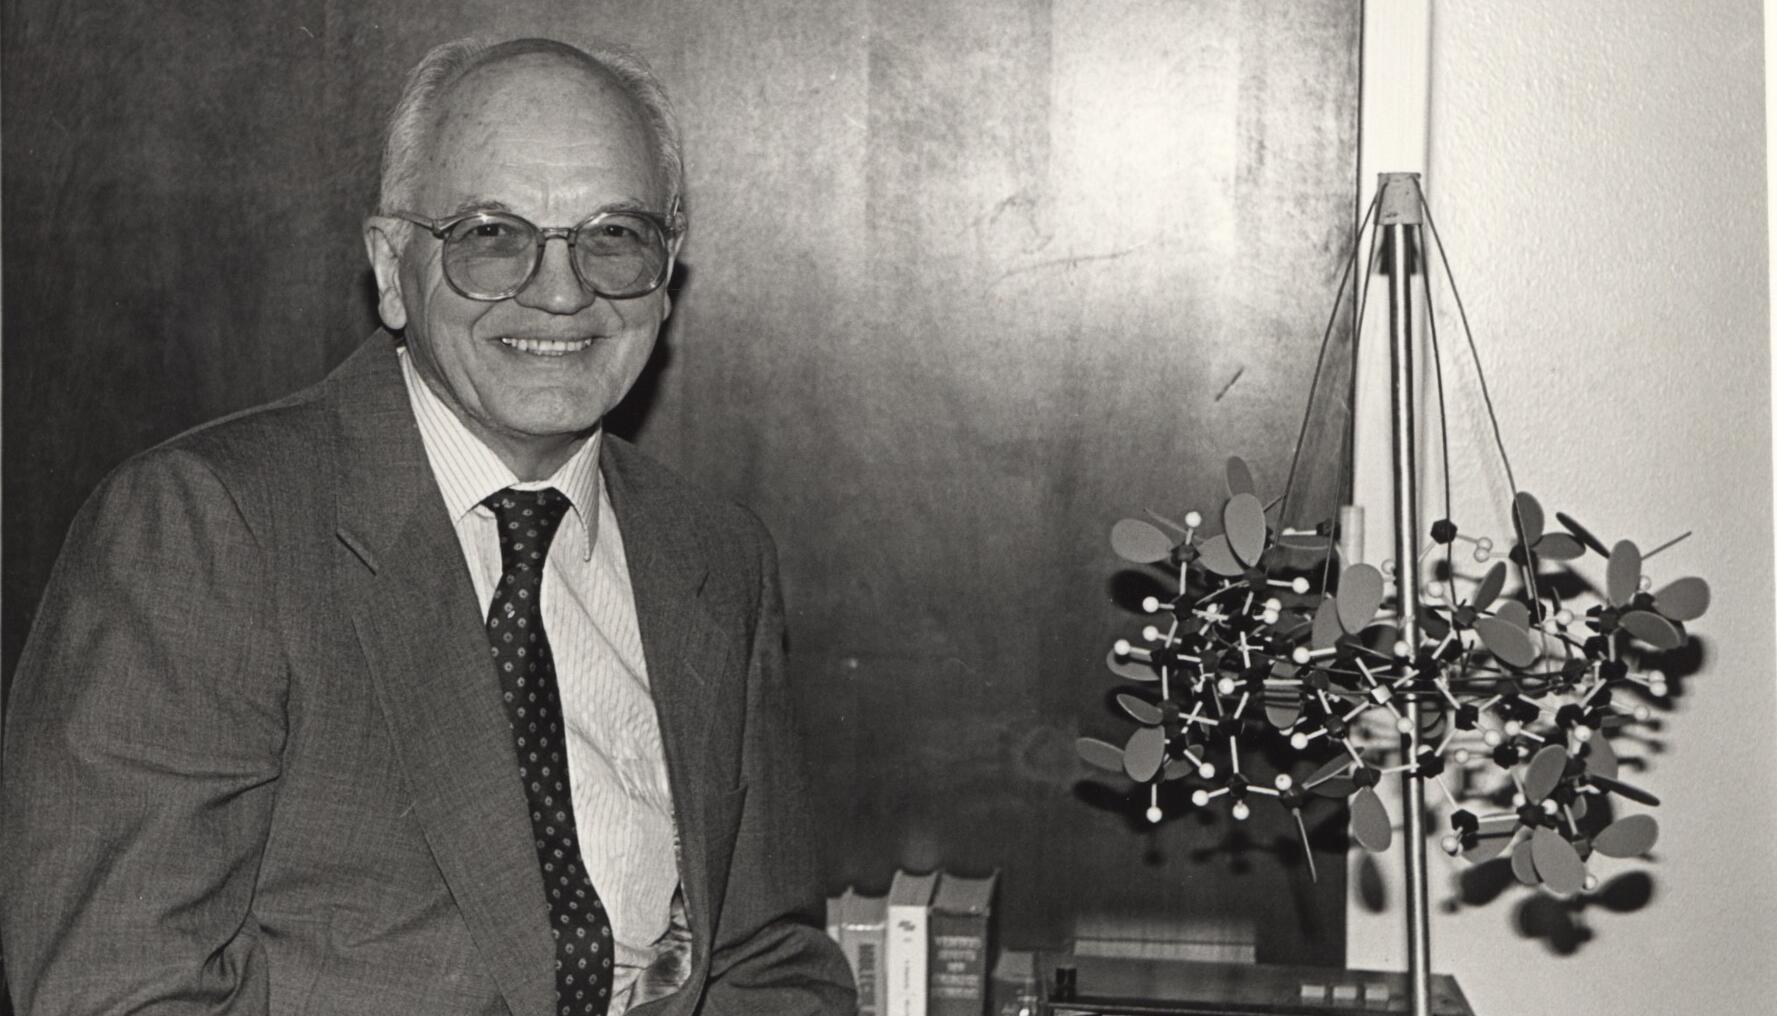 Chester Thomas O'Konski